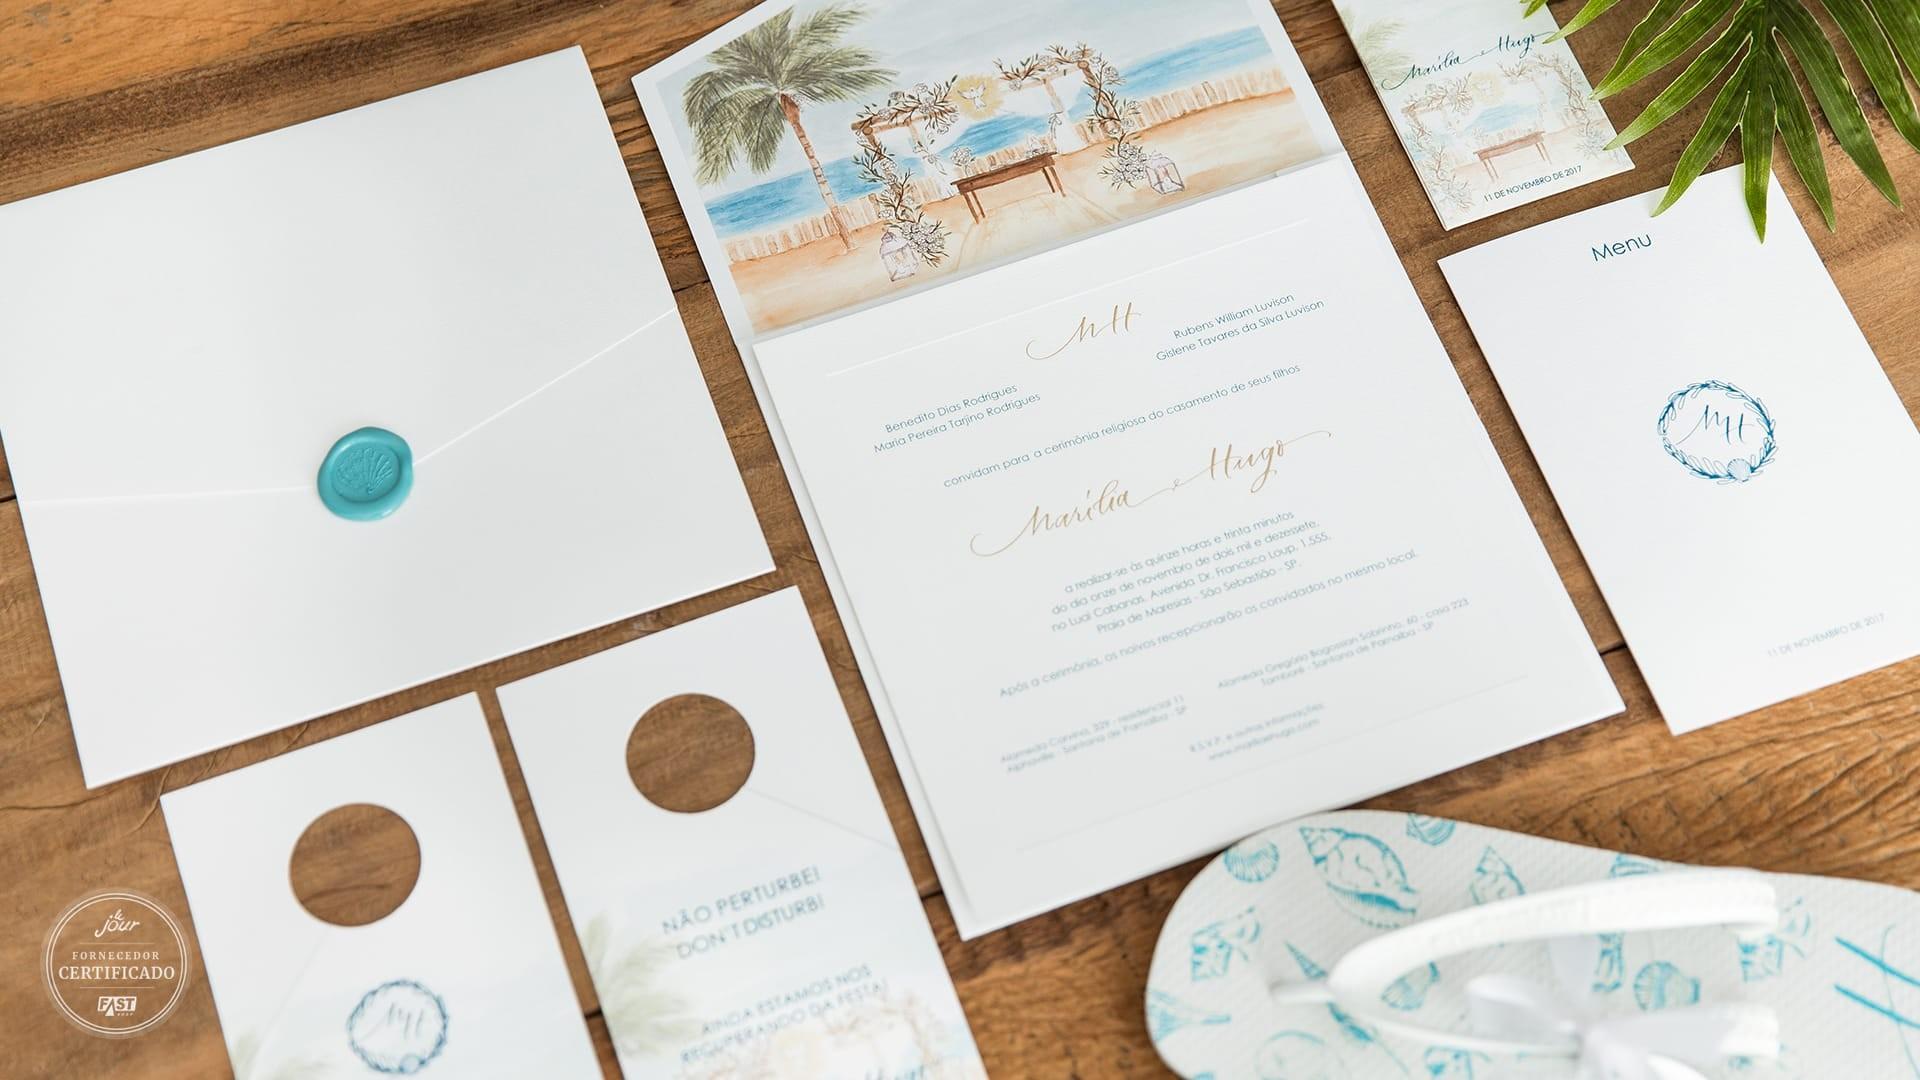 Papelaria completa para casamento na praia.